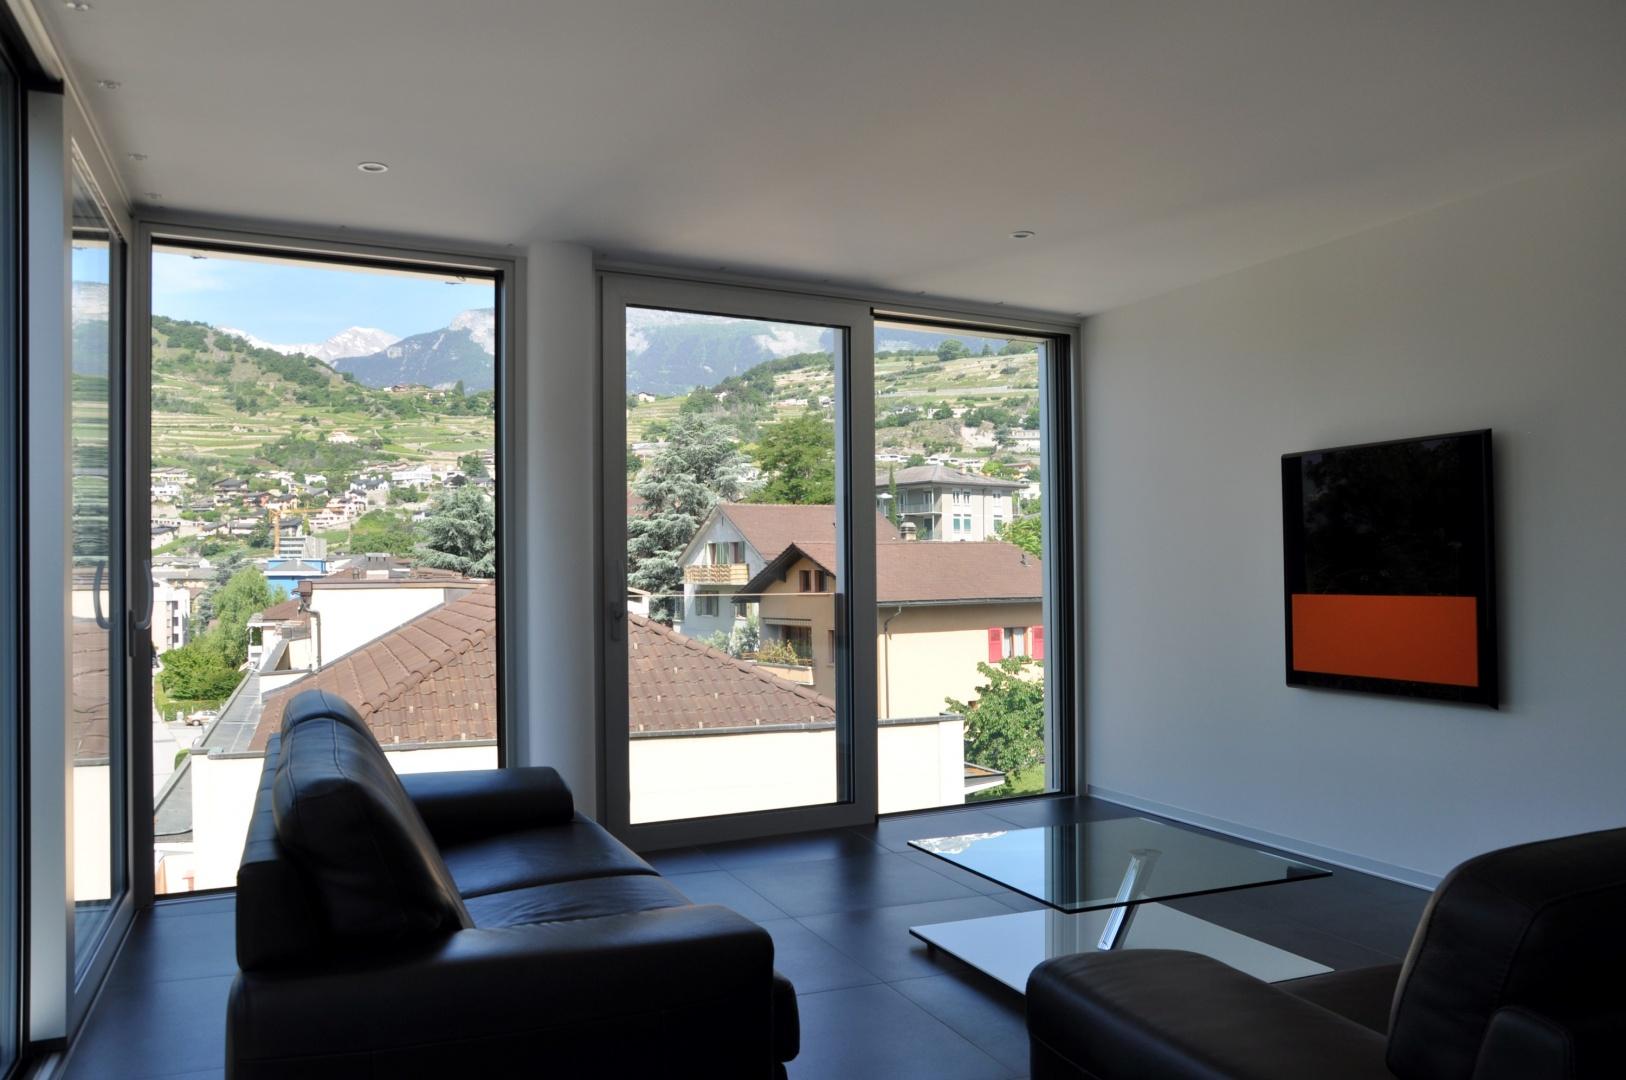 Innenansicht 2 Wohnung © Savioz & Di Berardino architectes